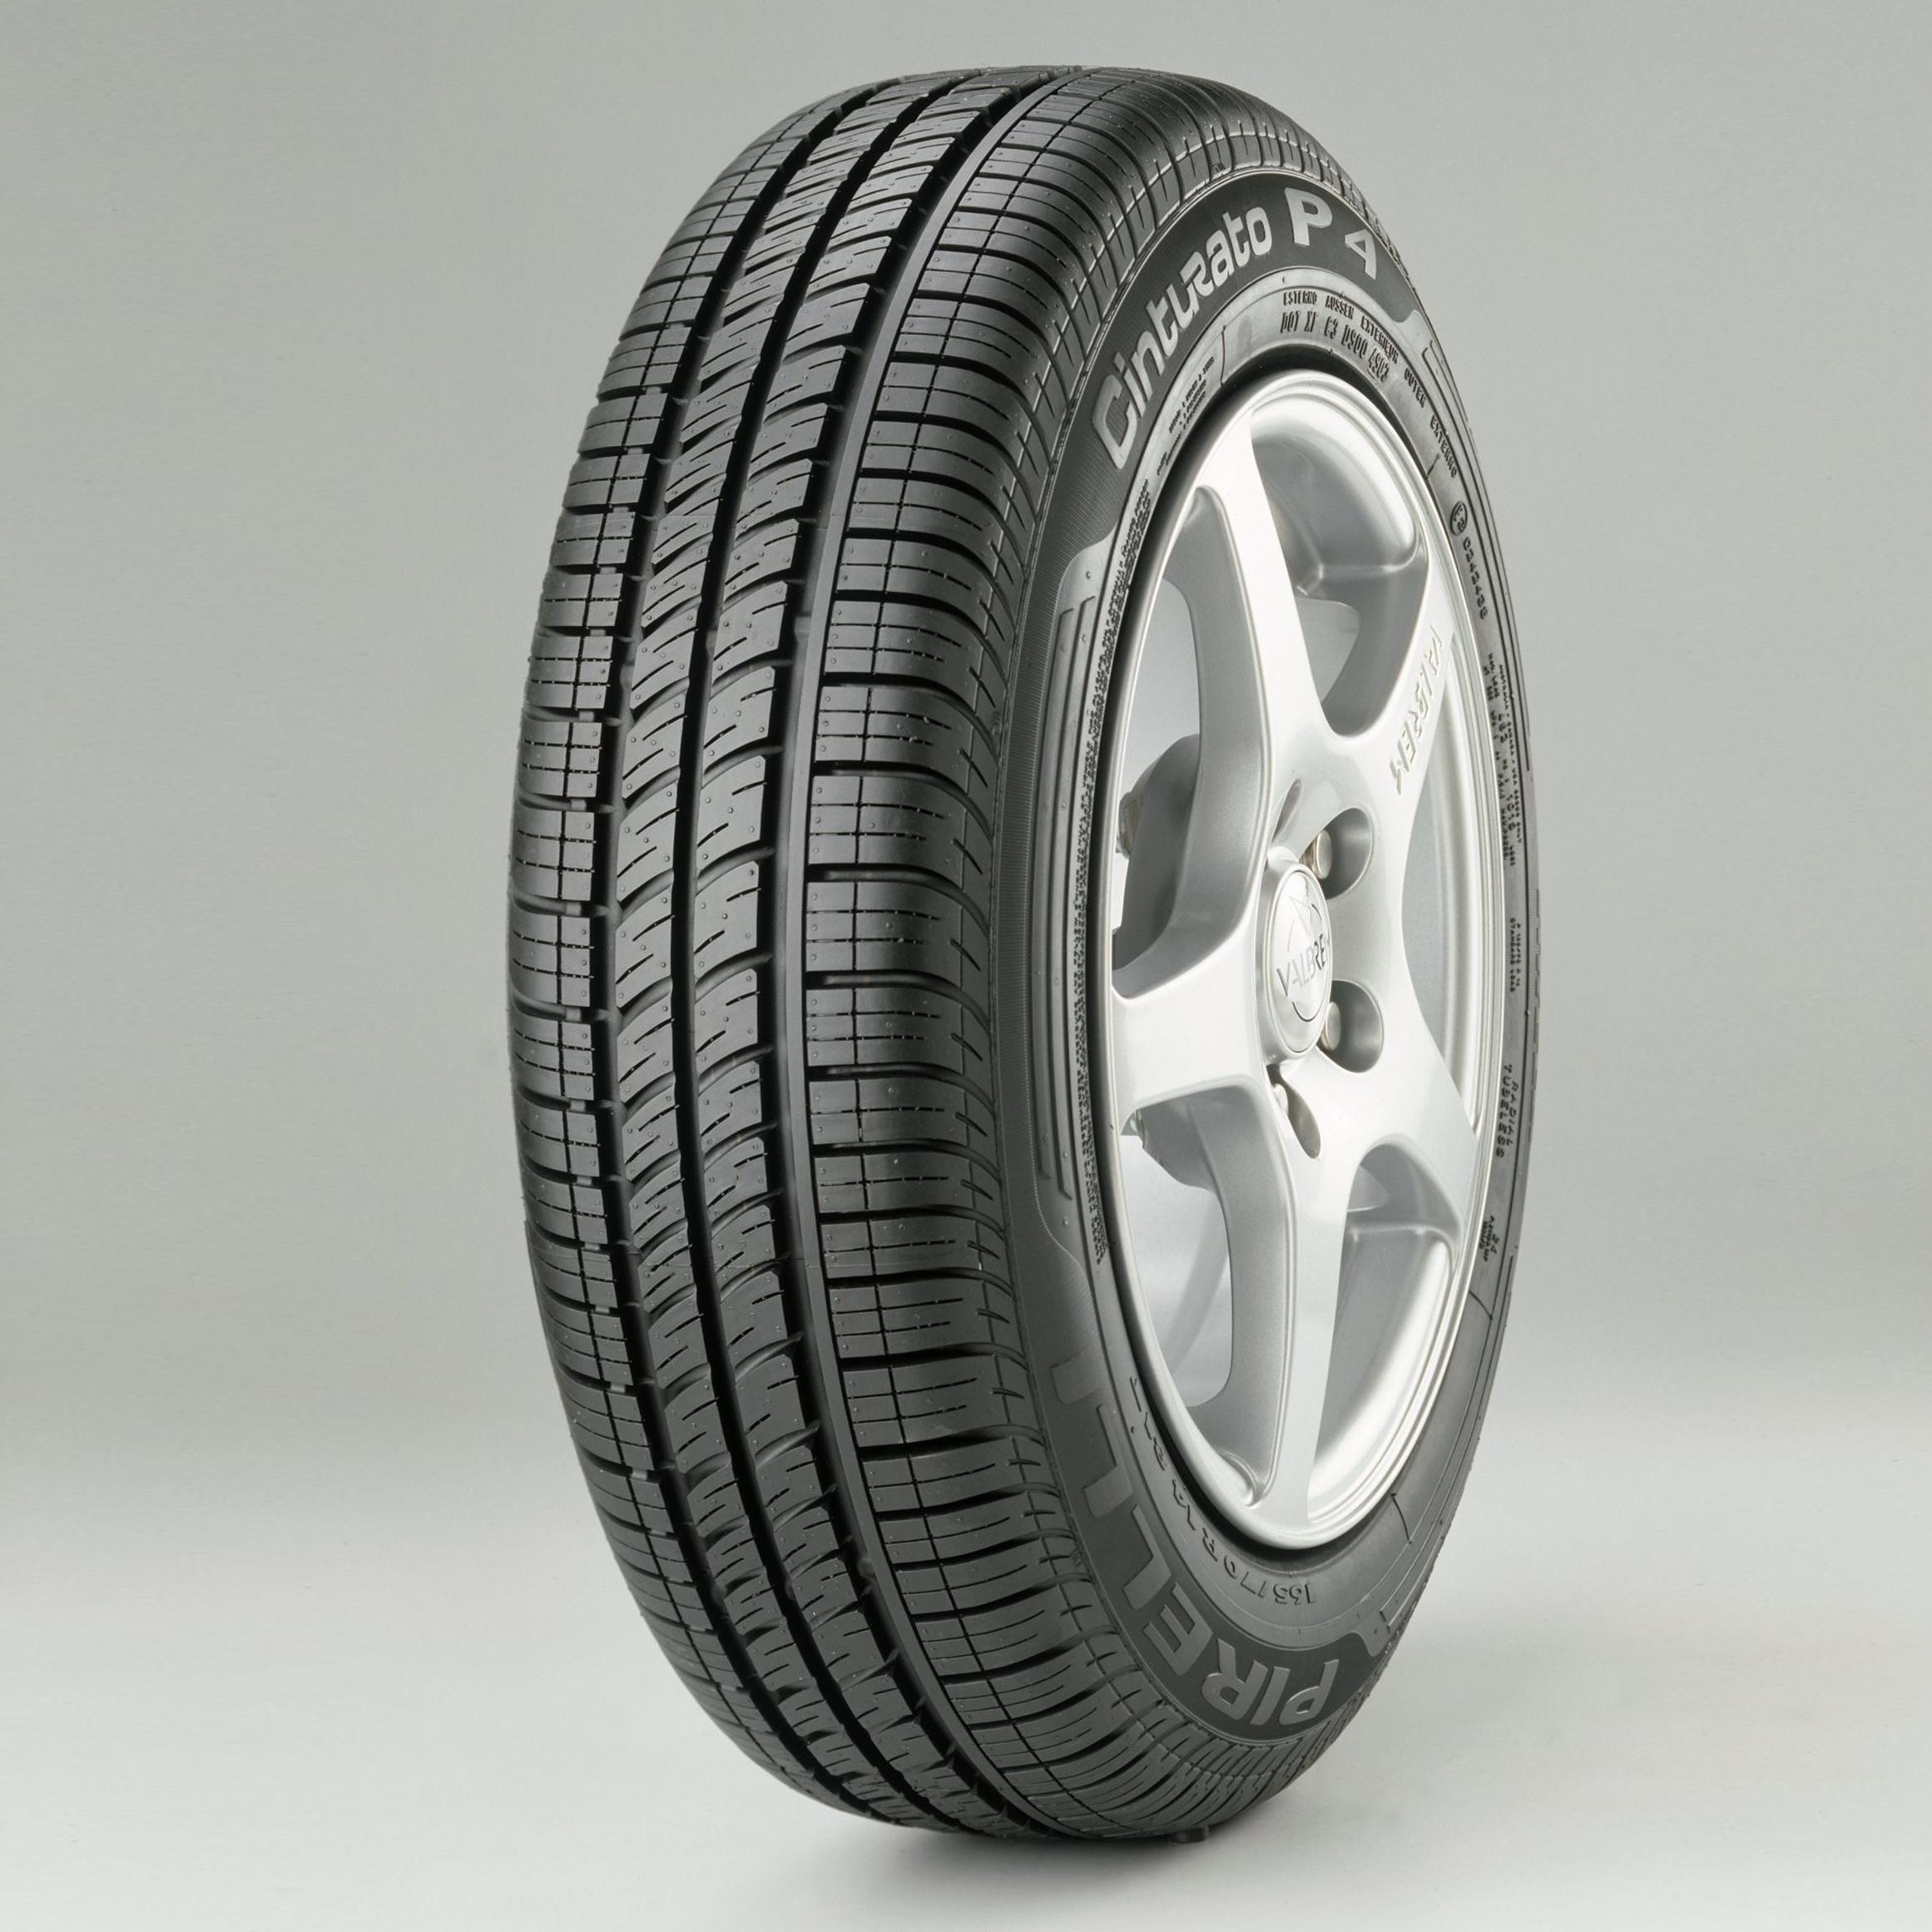 Pirelli Cinturato P4 175/70 R 13 Tubeless 82 T Car Tyre